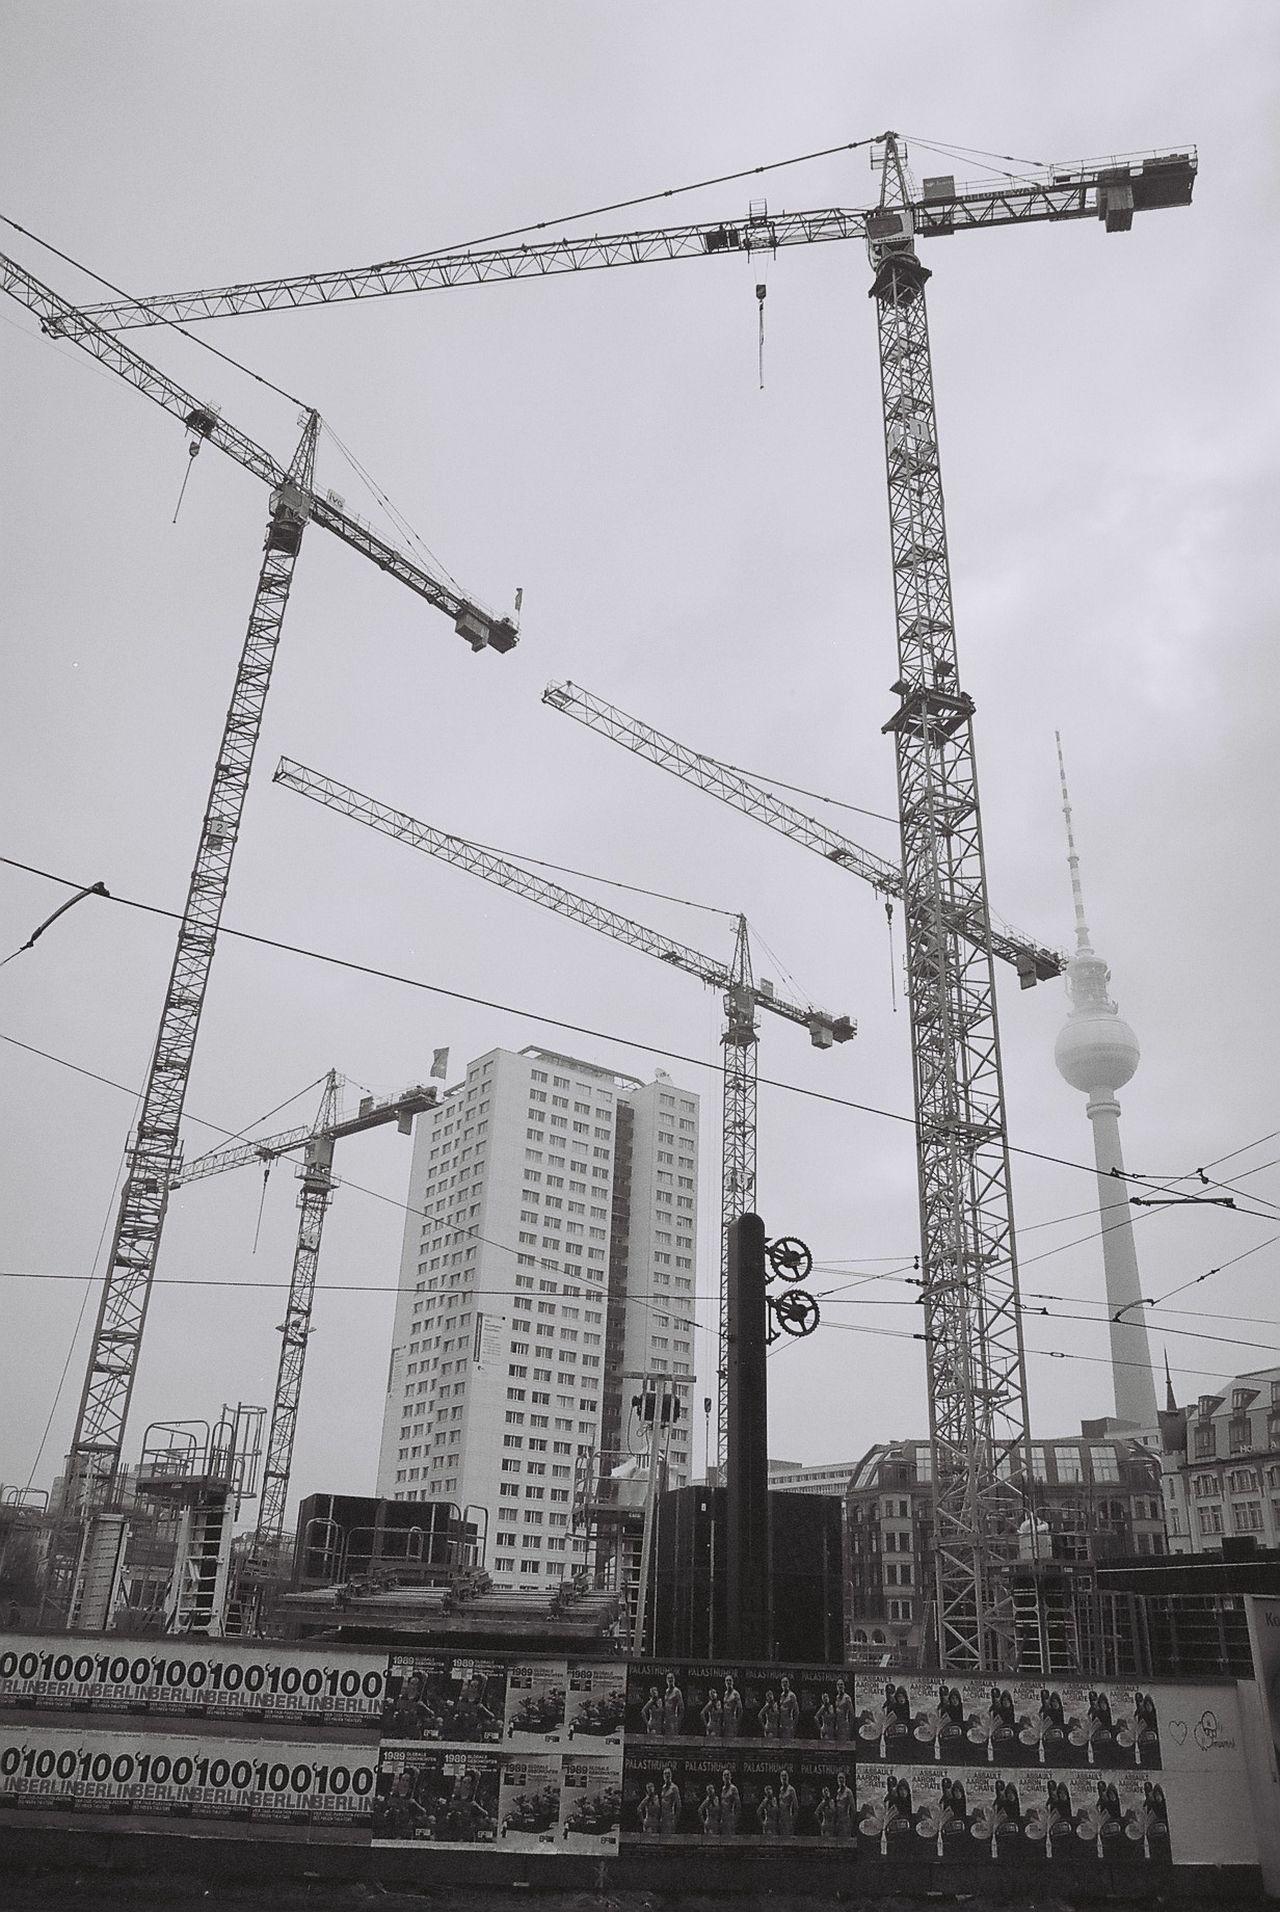 Architecture Building Exterior Built Structure Capture Berlin City Construction Day Development Electricity  Electricity Pylon Low Angle View Metal No People Outdoors Power Line  Sky